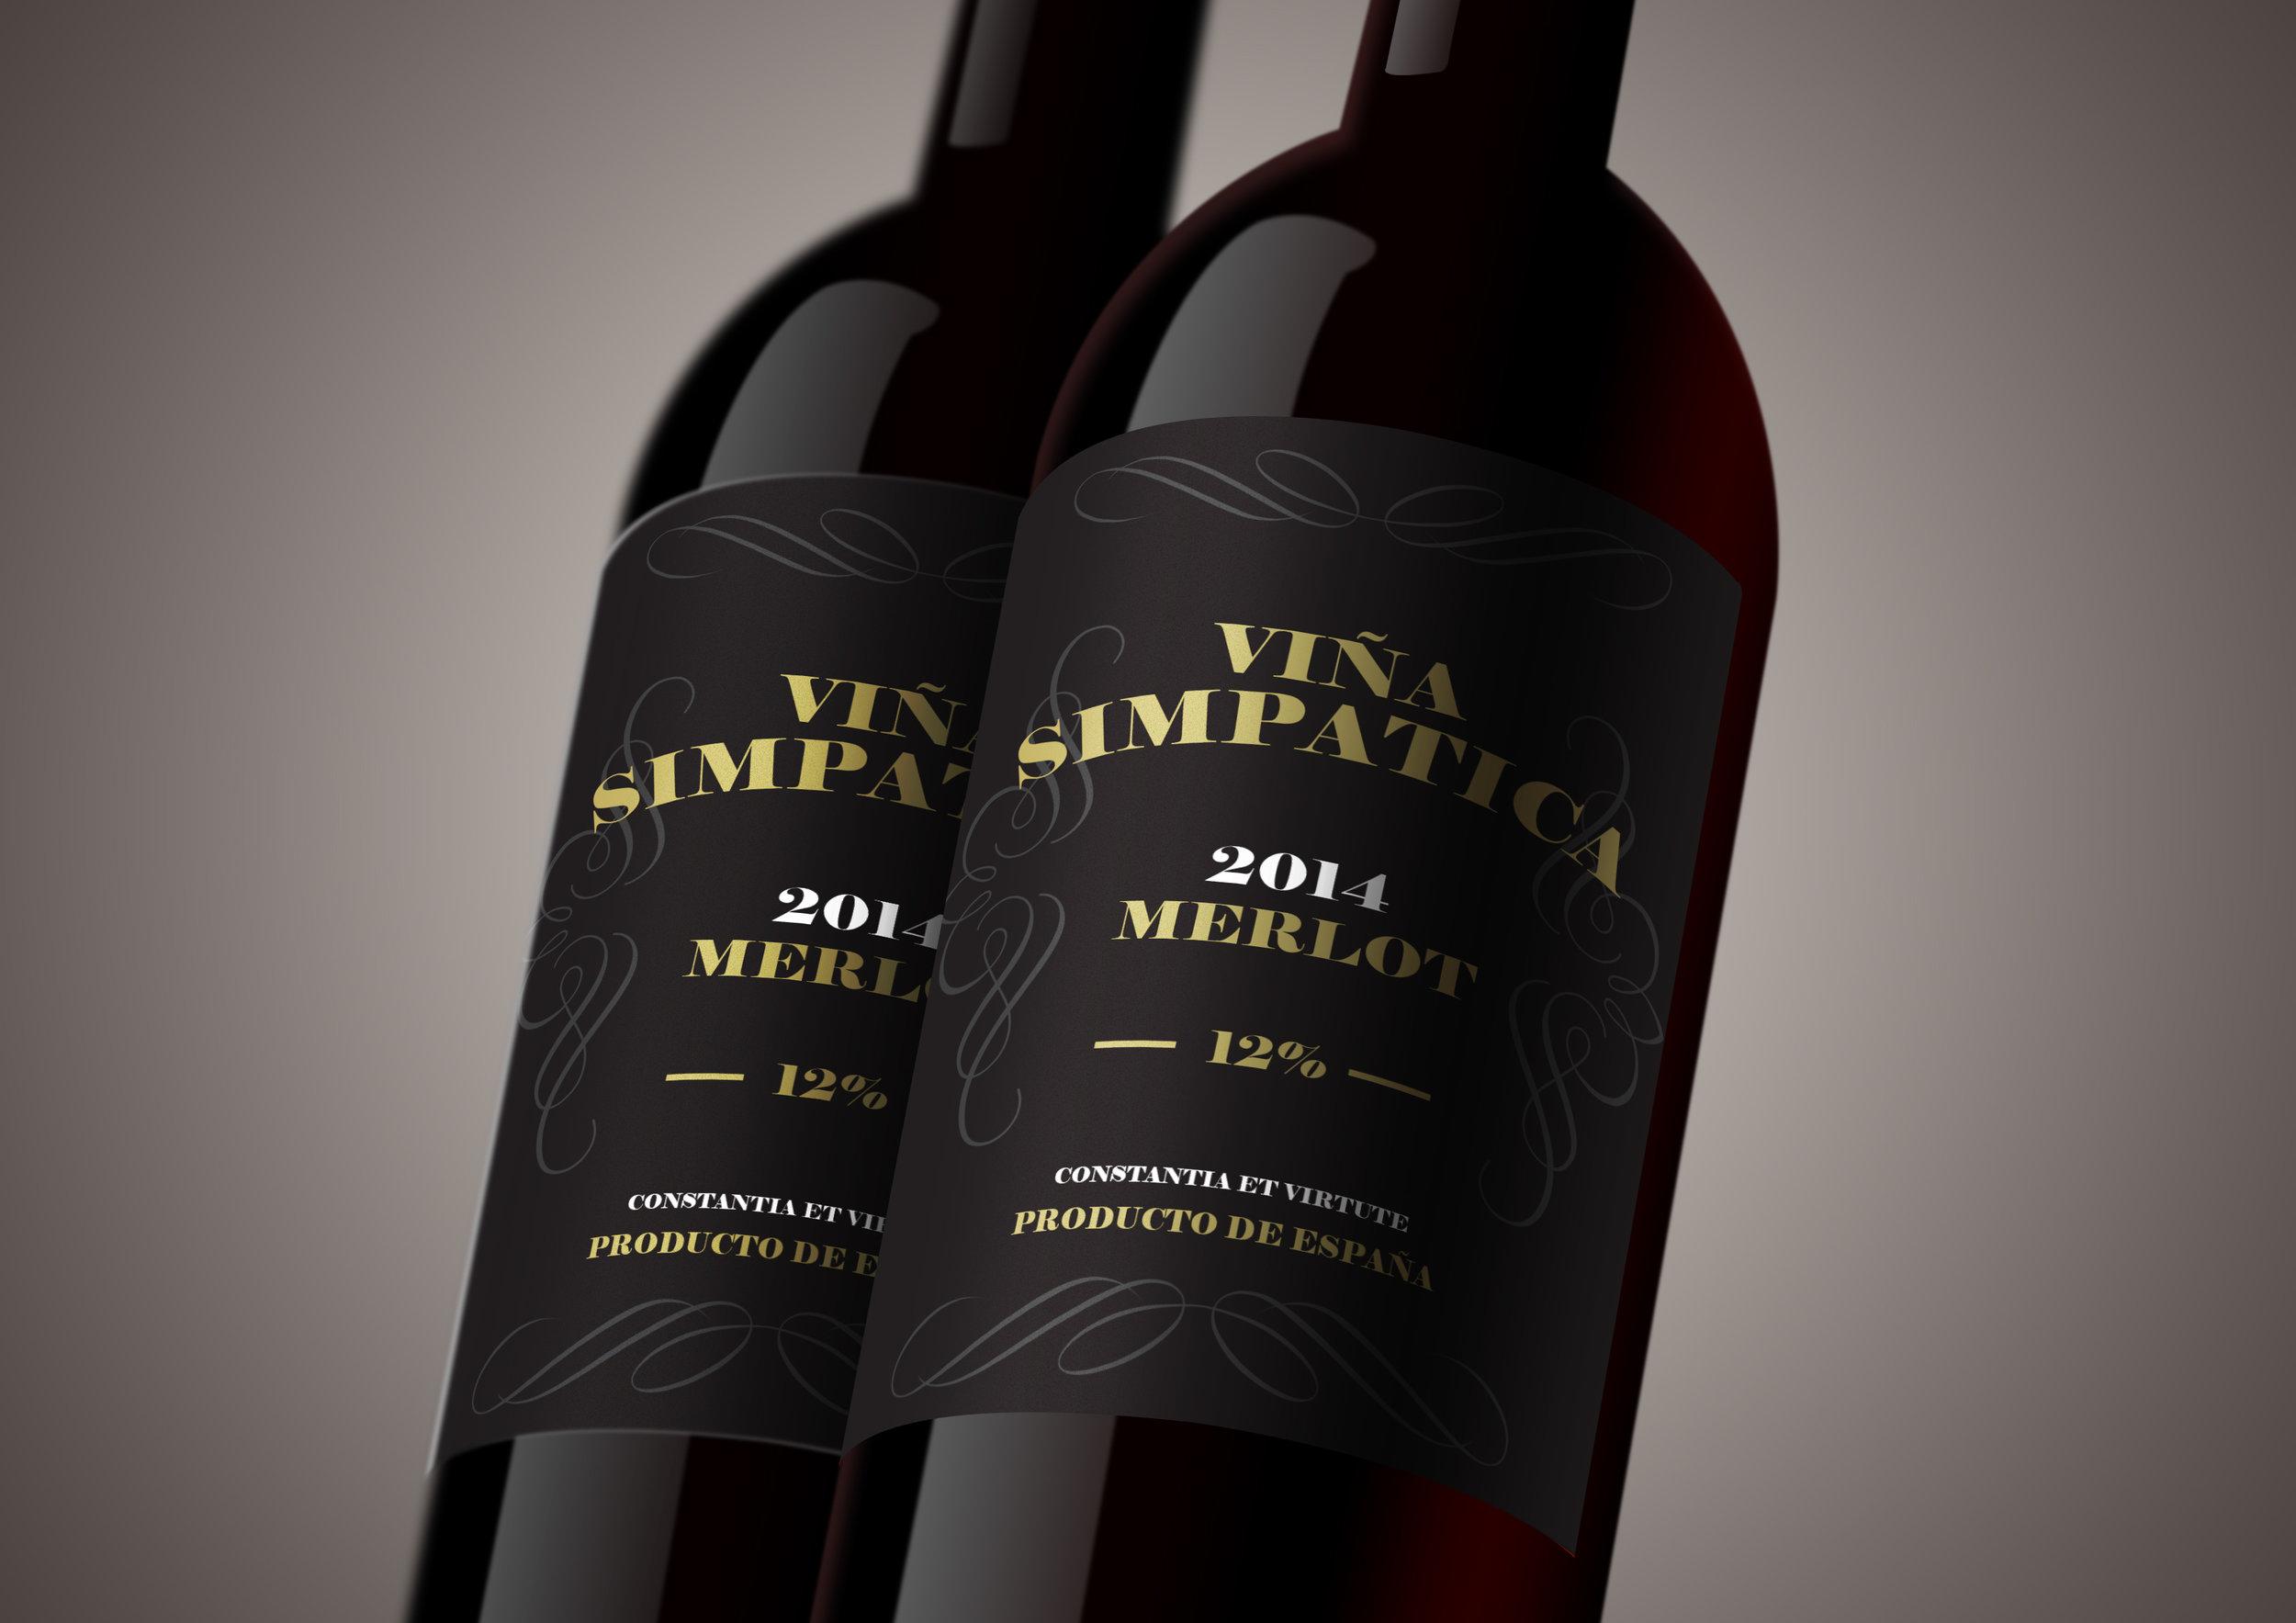 Vina Simpatica 2 bottle shot.jpg